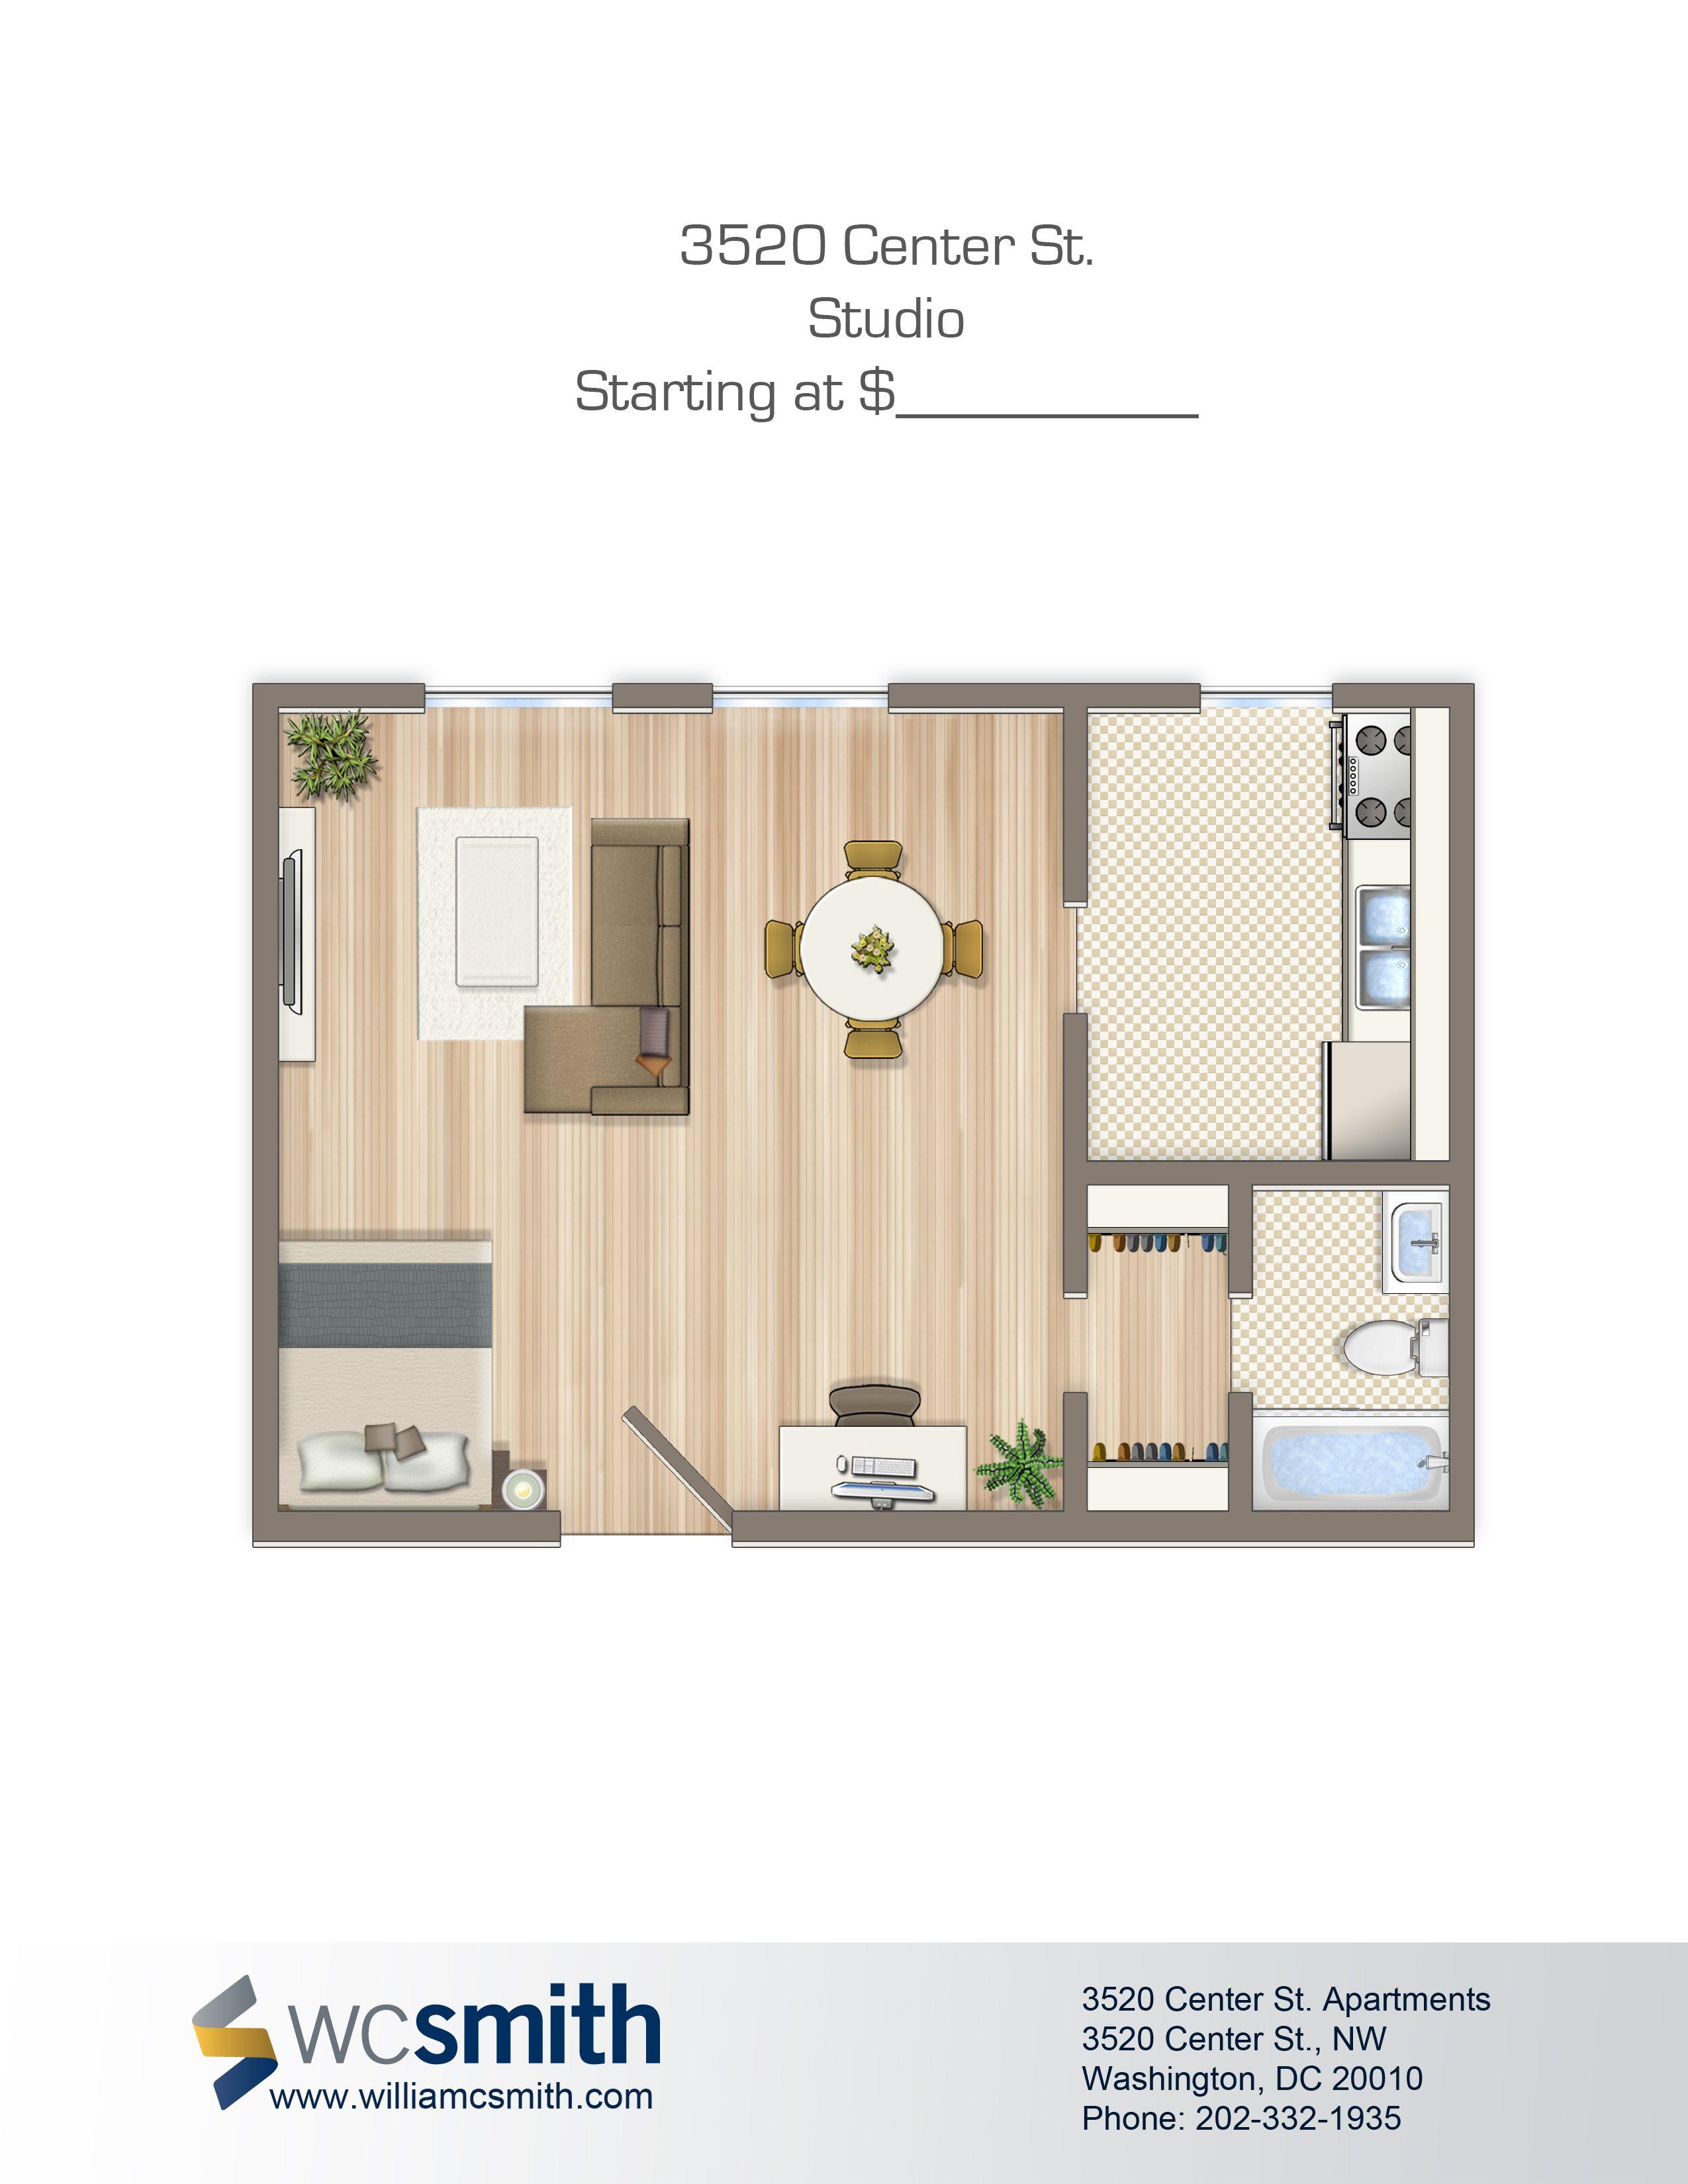 Studio/Efficiency Floor Plan Alpha House Apartments in